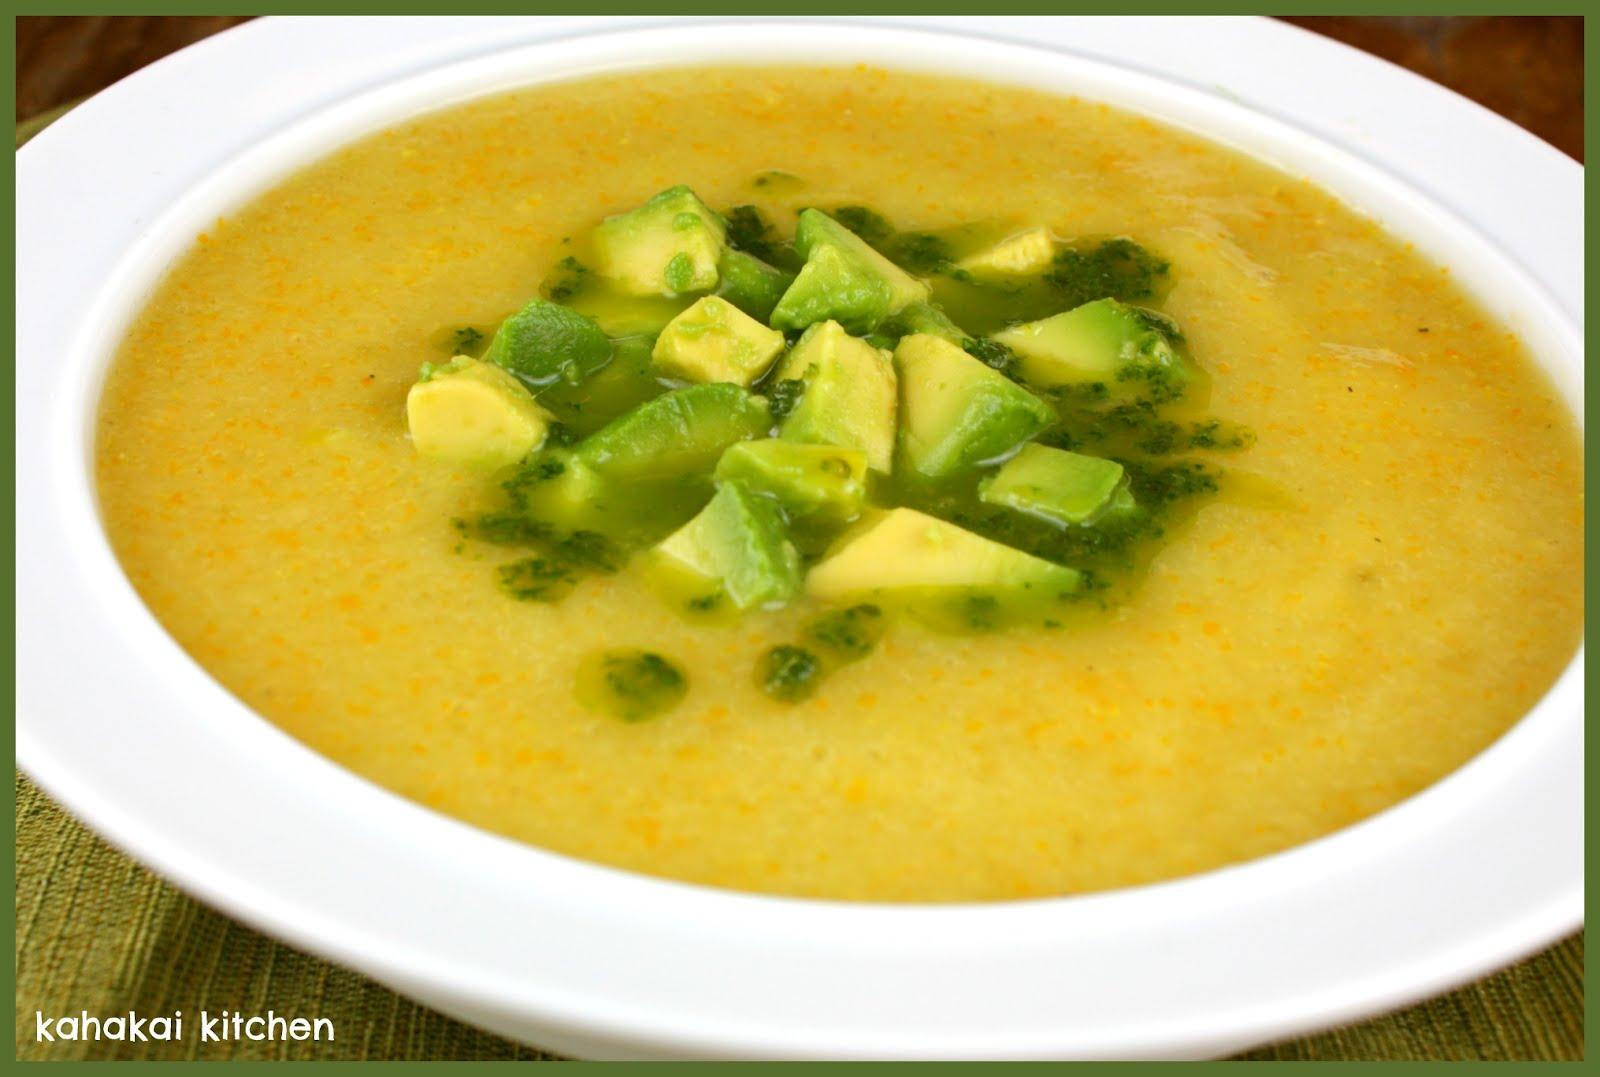 ... Cilantro OIl and Avocado for Souper (Soup, Salad and Sammie) Sundays